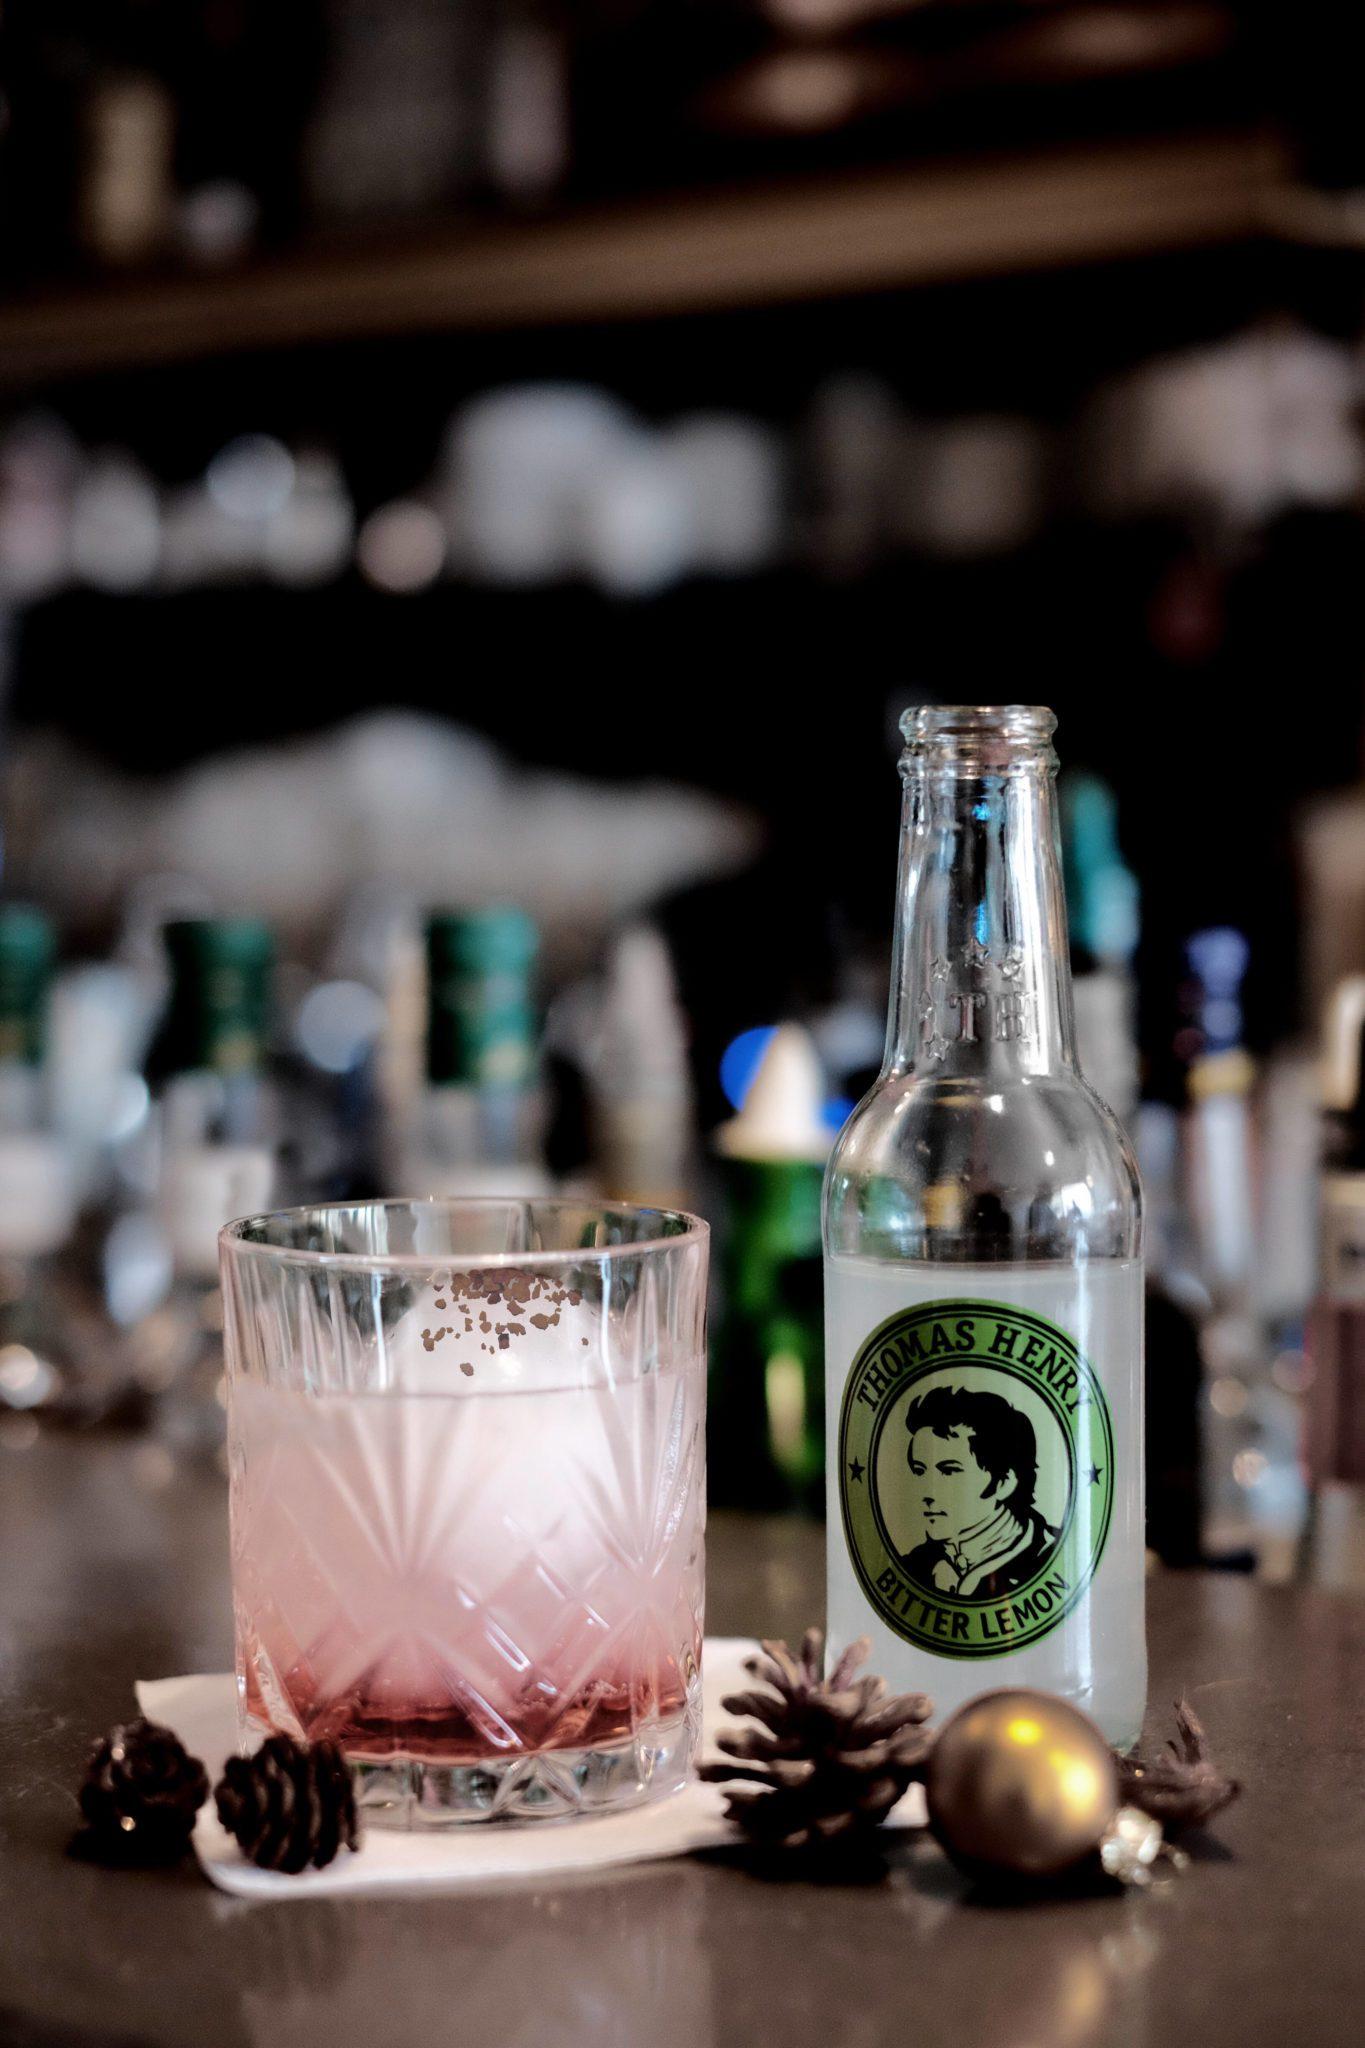 Der Drink On Winter mit Thomas Henry Bitter Lemon